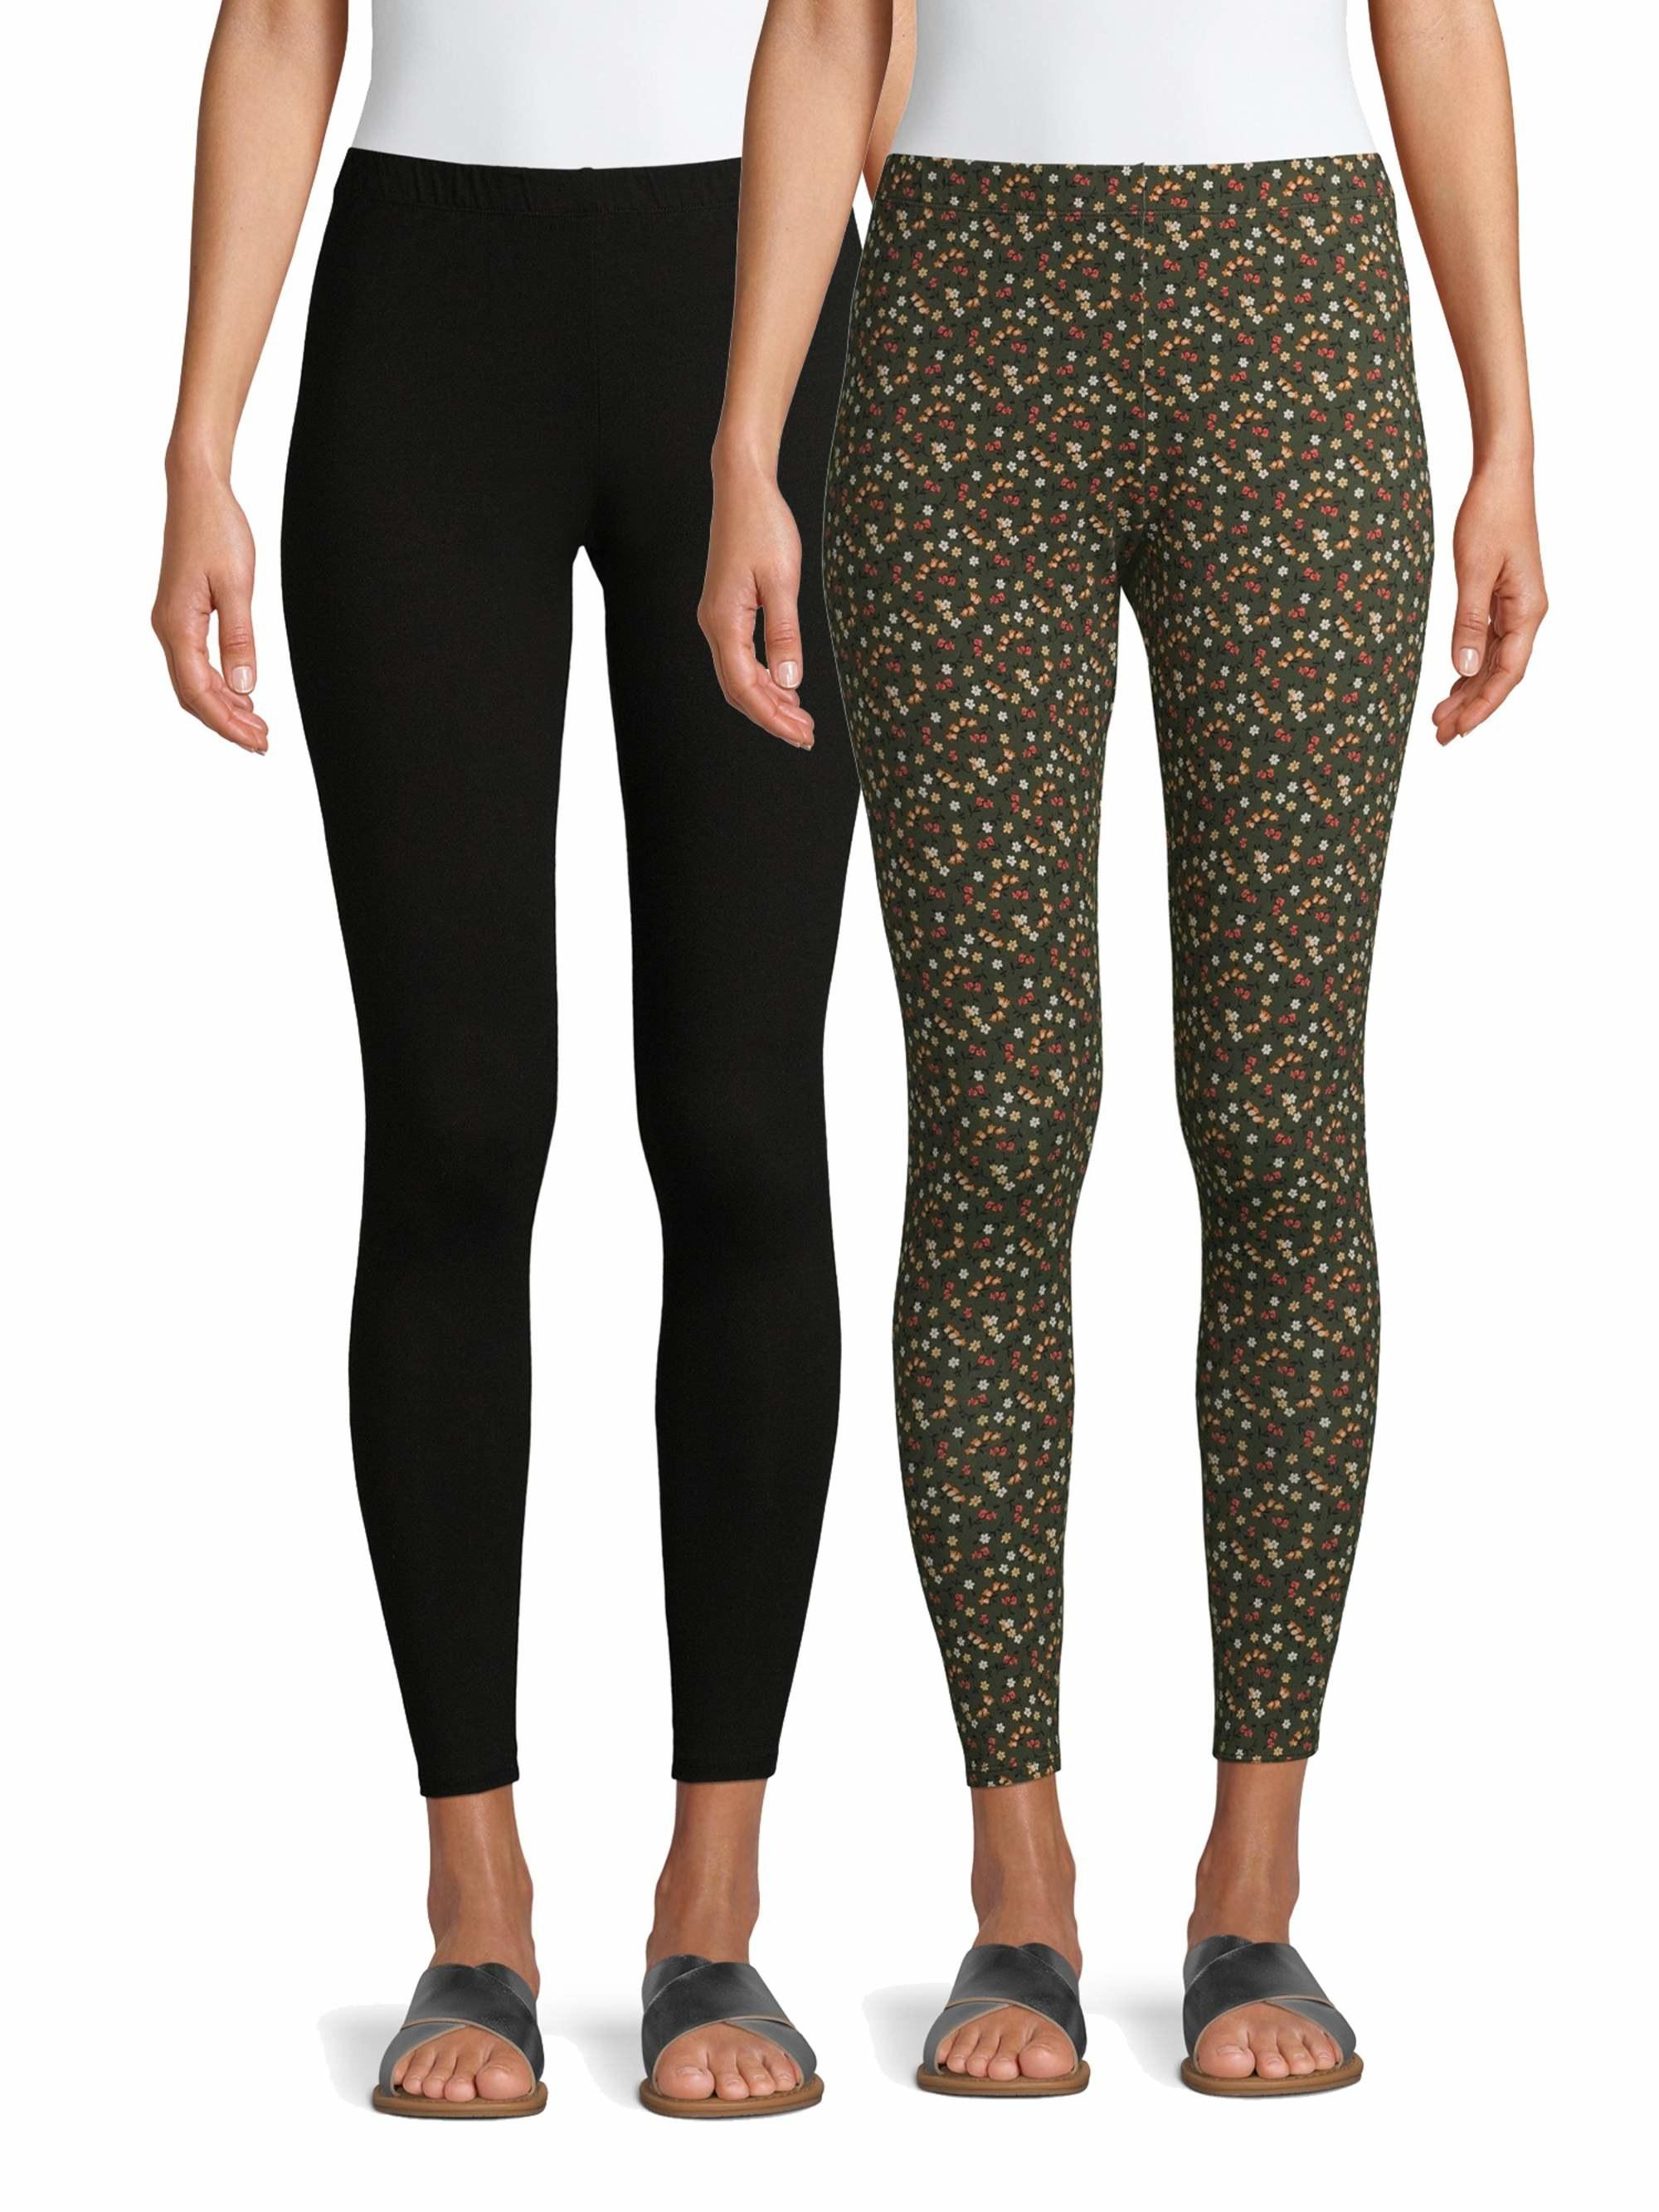 Models wear Ditsy Floral and Black Soot leggings